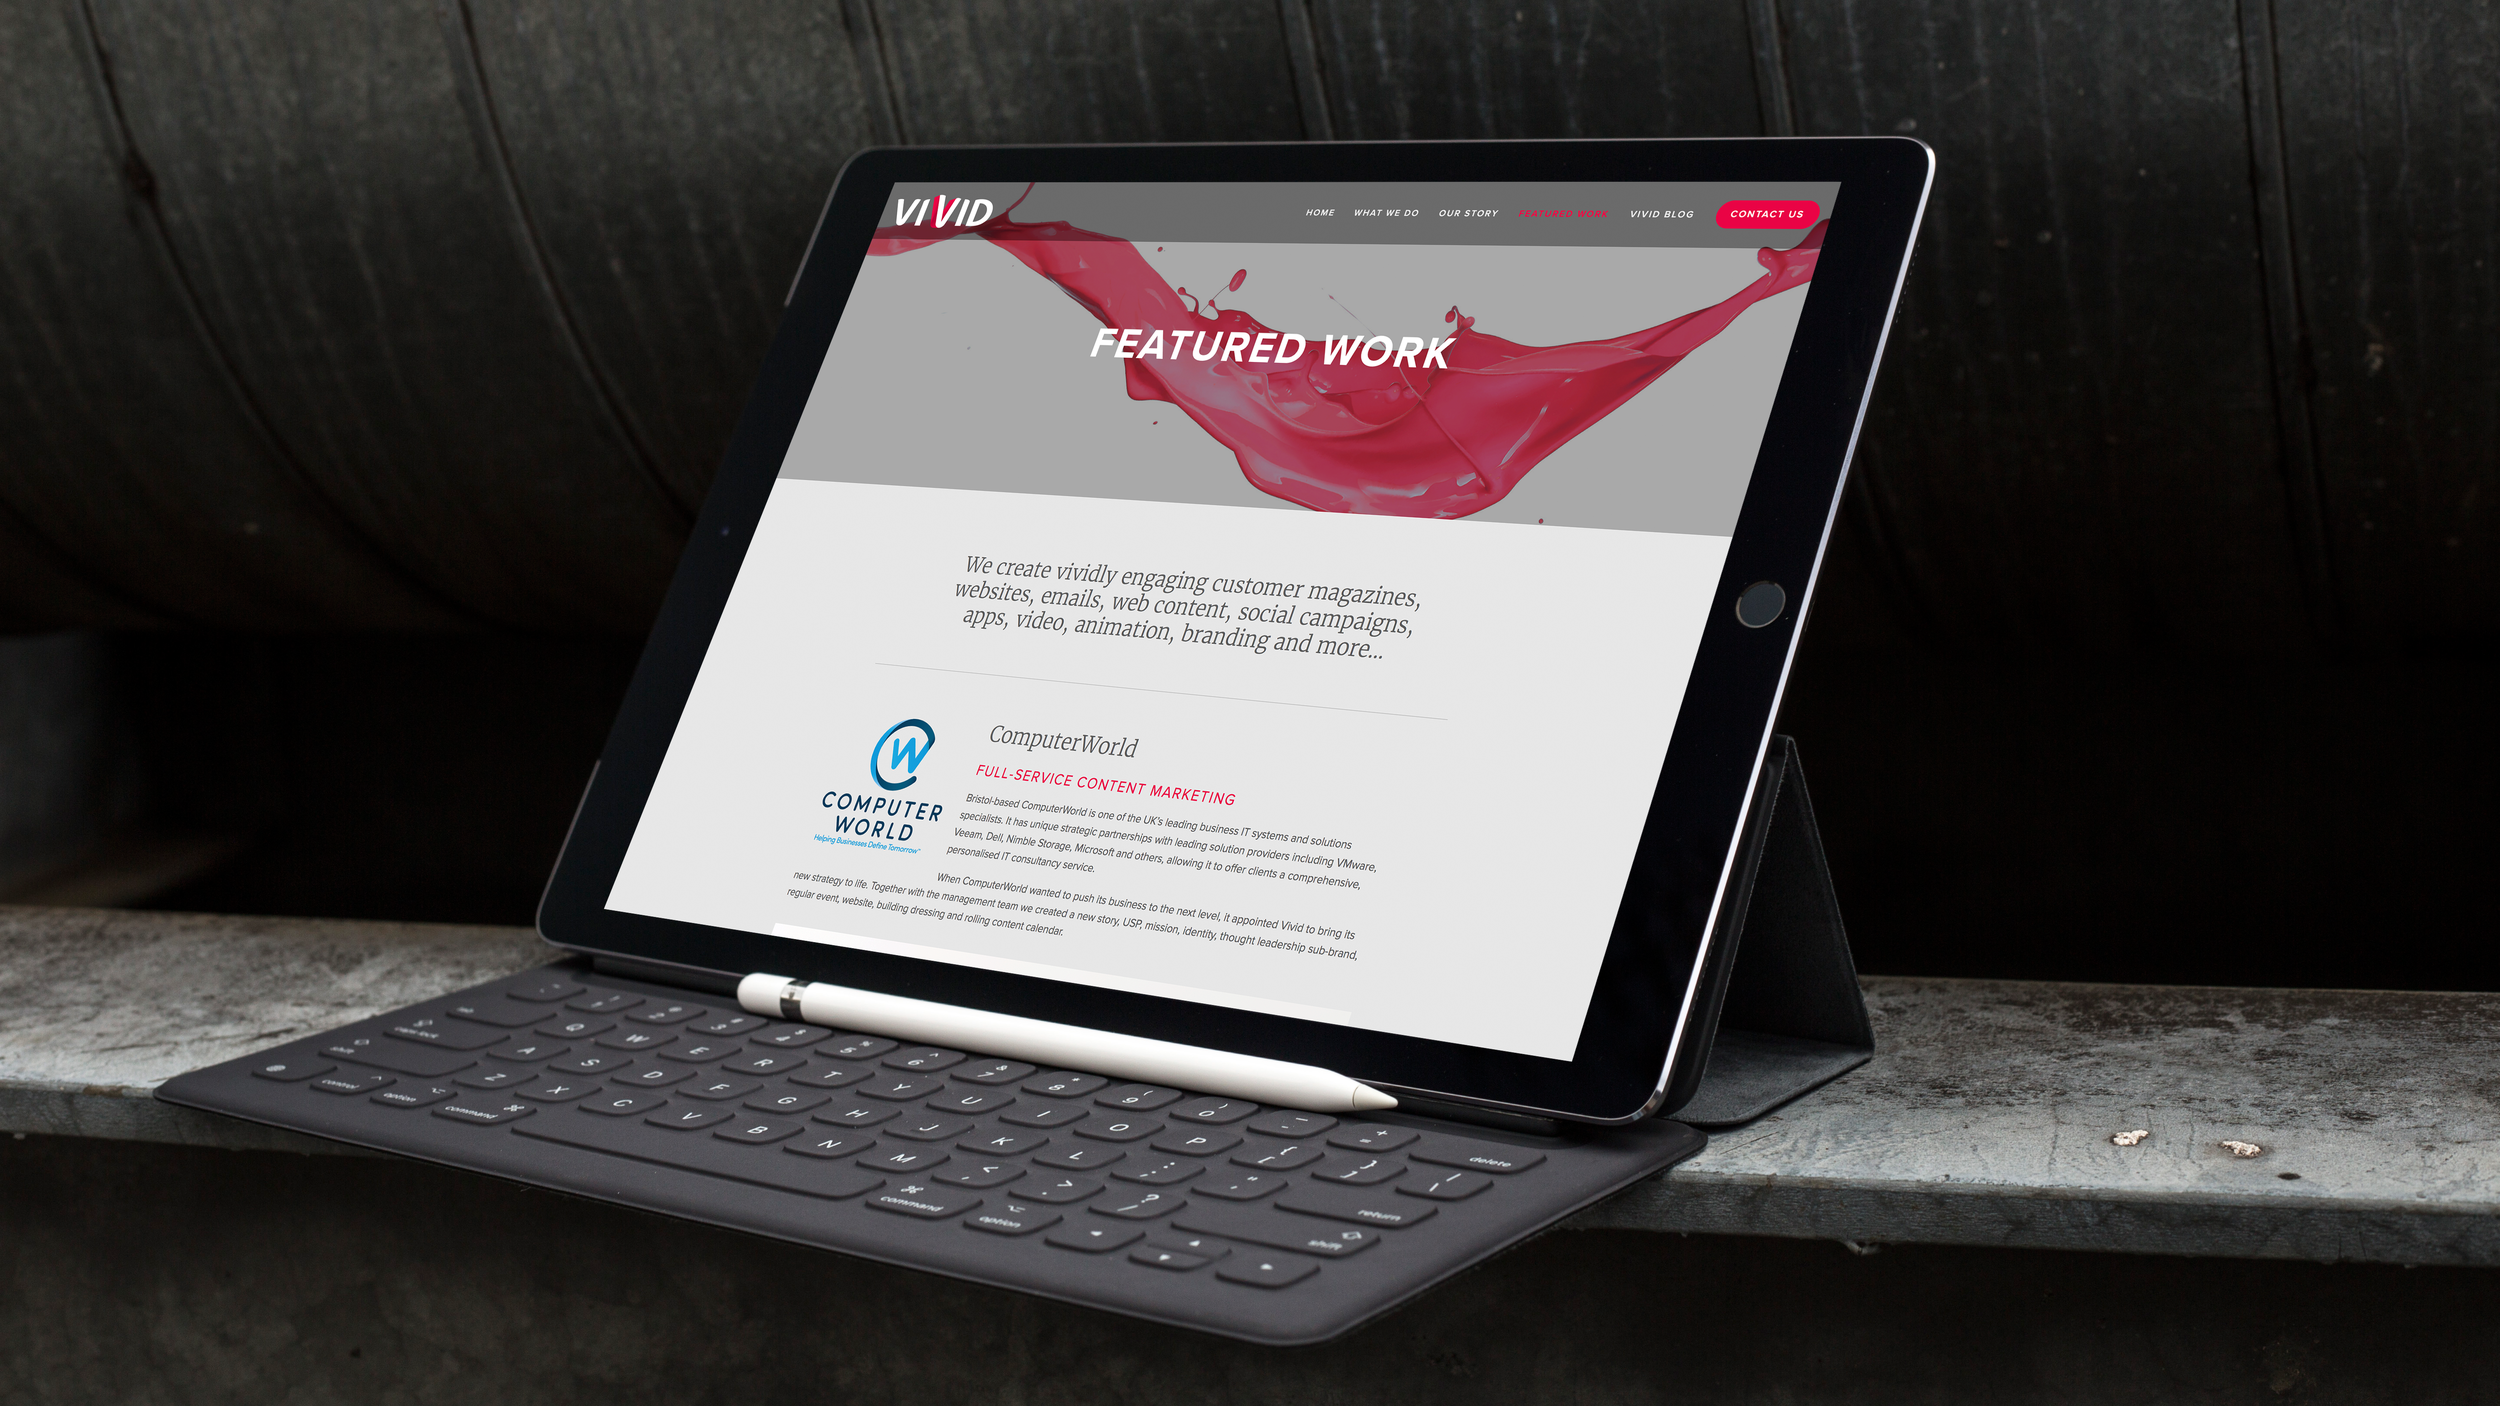 vivid content marketing featured work